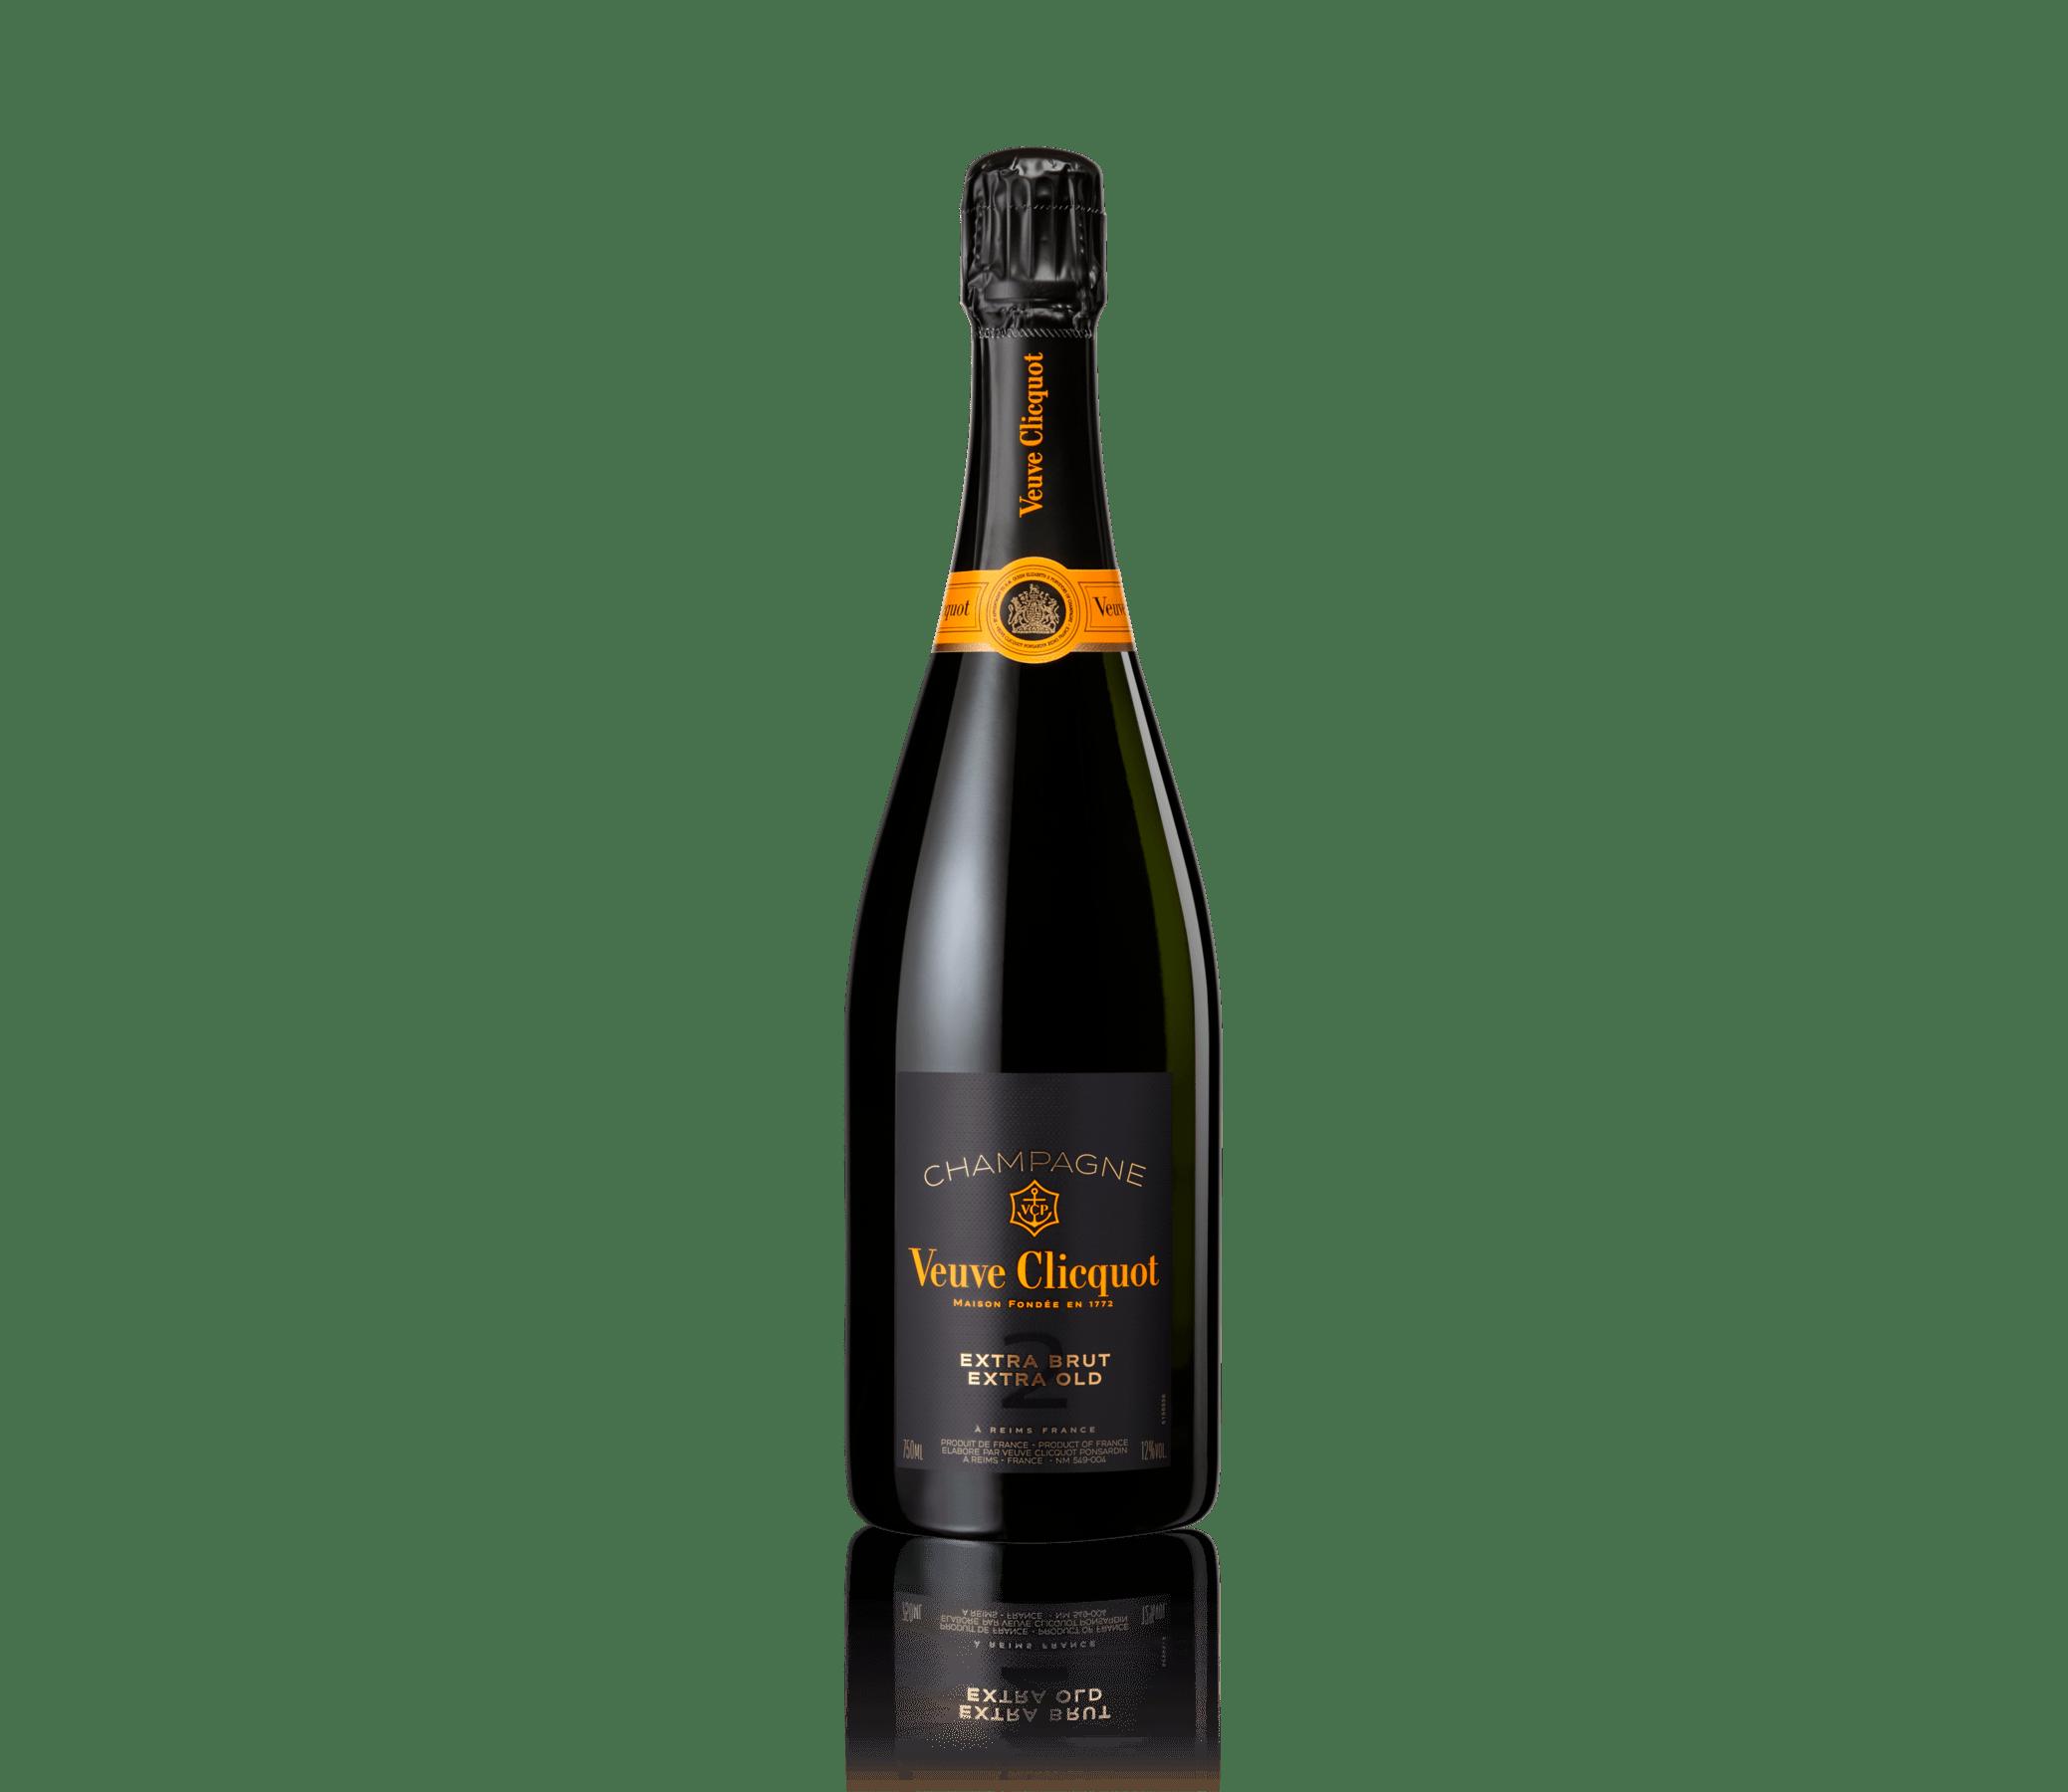 Бутылка шампанского Veuve Clicquot Extra Brut Extra Old 2